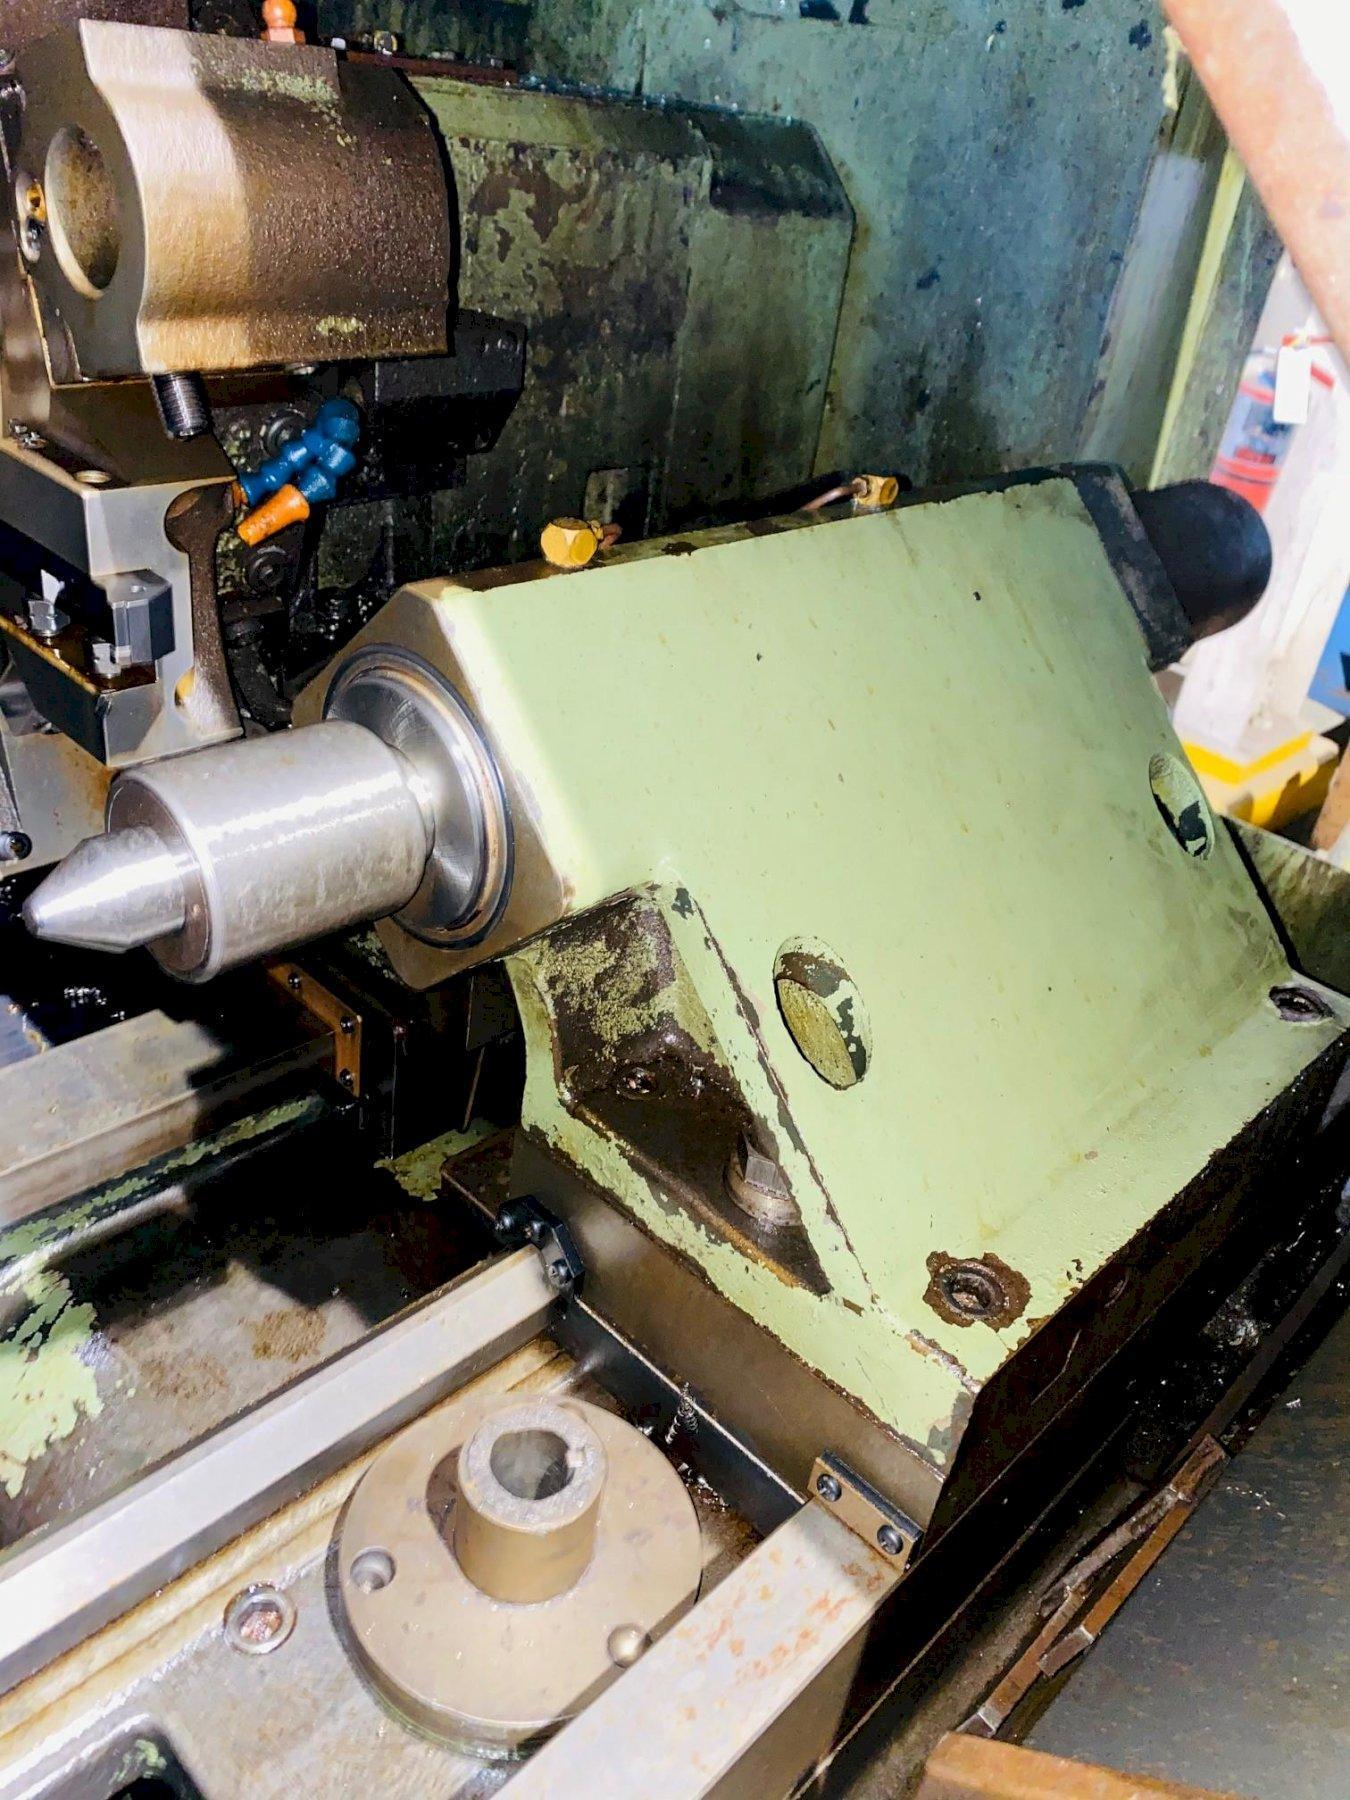 HITACHI- SEIKI MODEL 4NEII-600 CNC TURNING CENTER. STOCK # 0955420